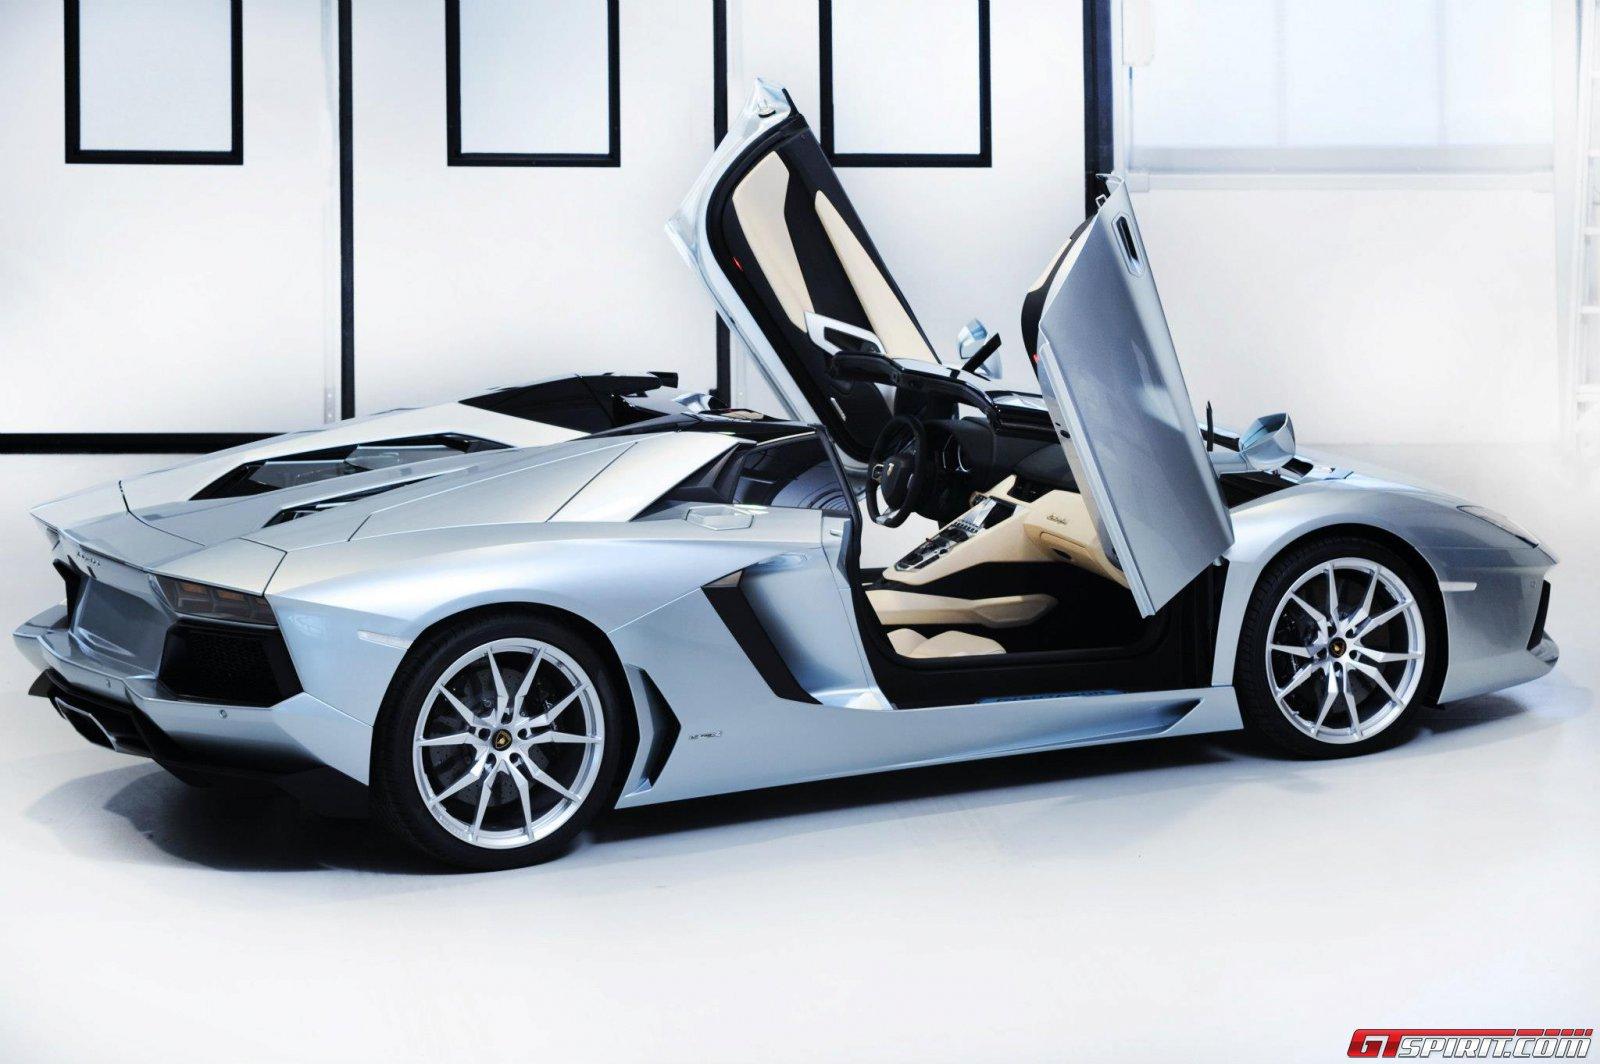 2013 Lamborghini Aventador LP700-4 Roadster Photo 25